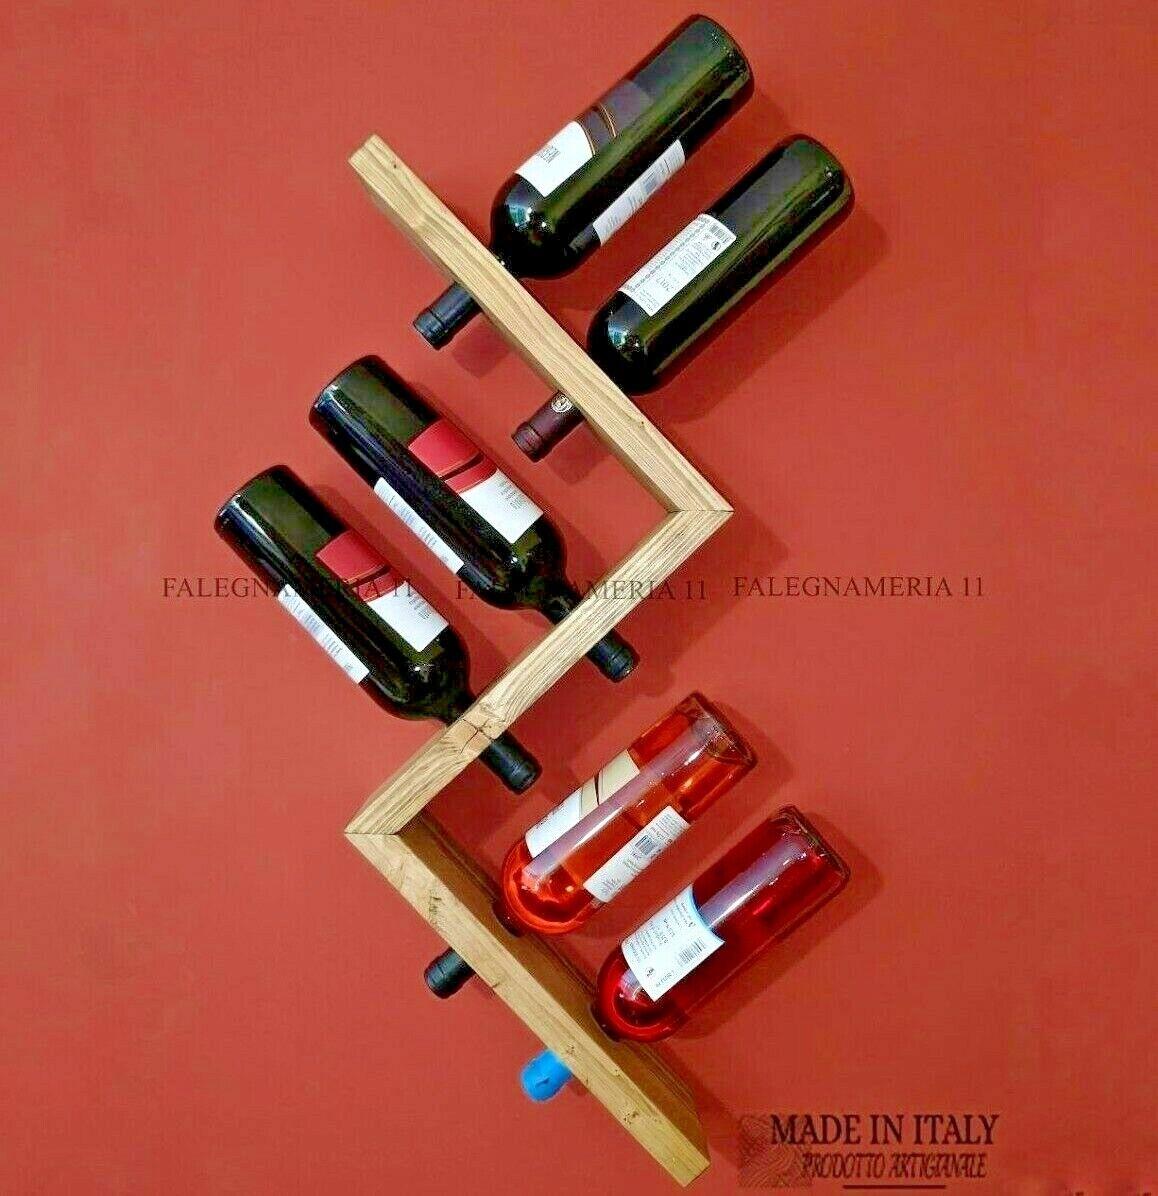 Cantinetta portabottiglie di vino in legno da parete muro porta bottiglie